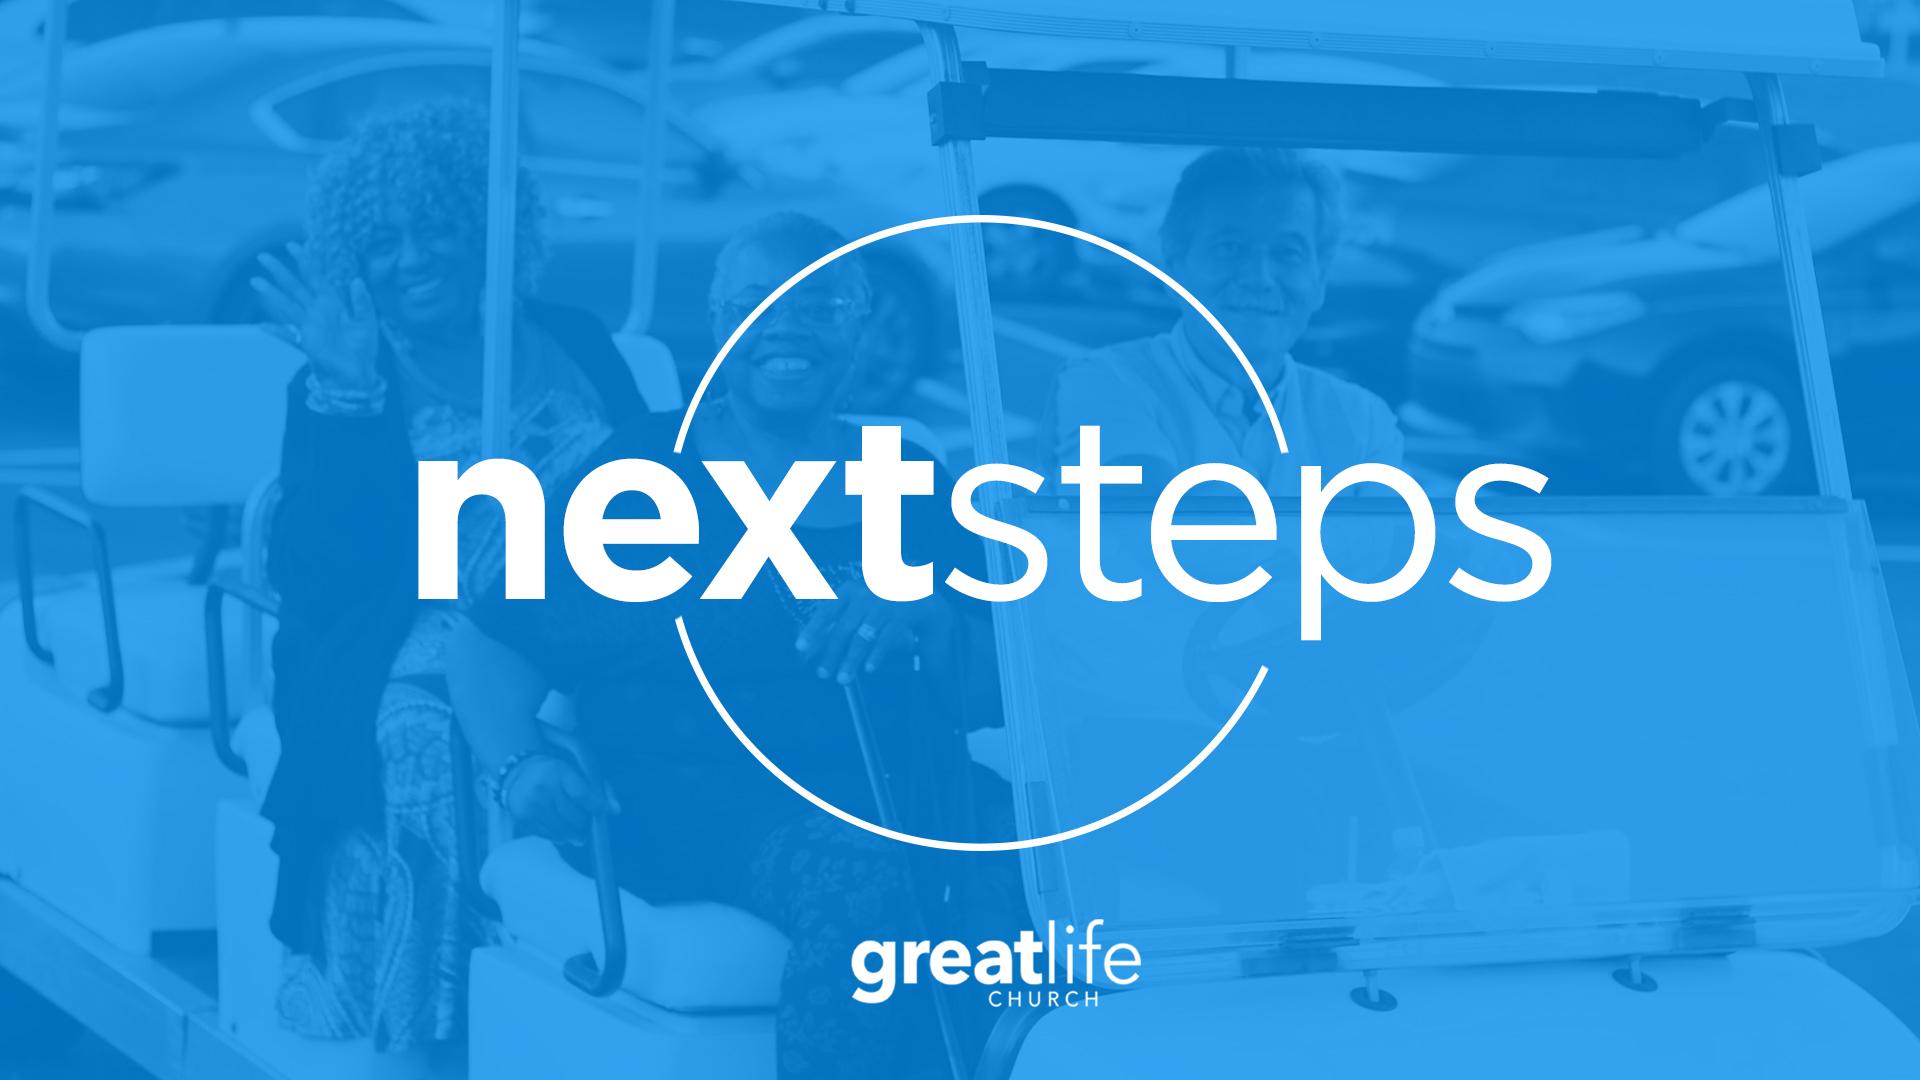 nextsteps-event-ss.jpg